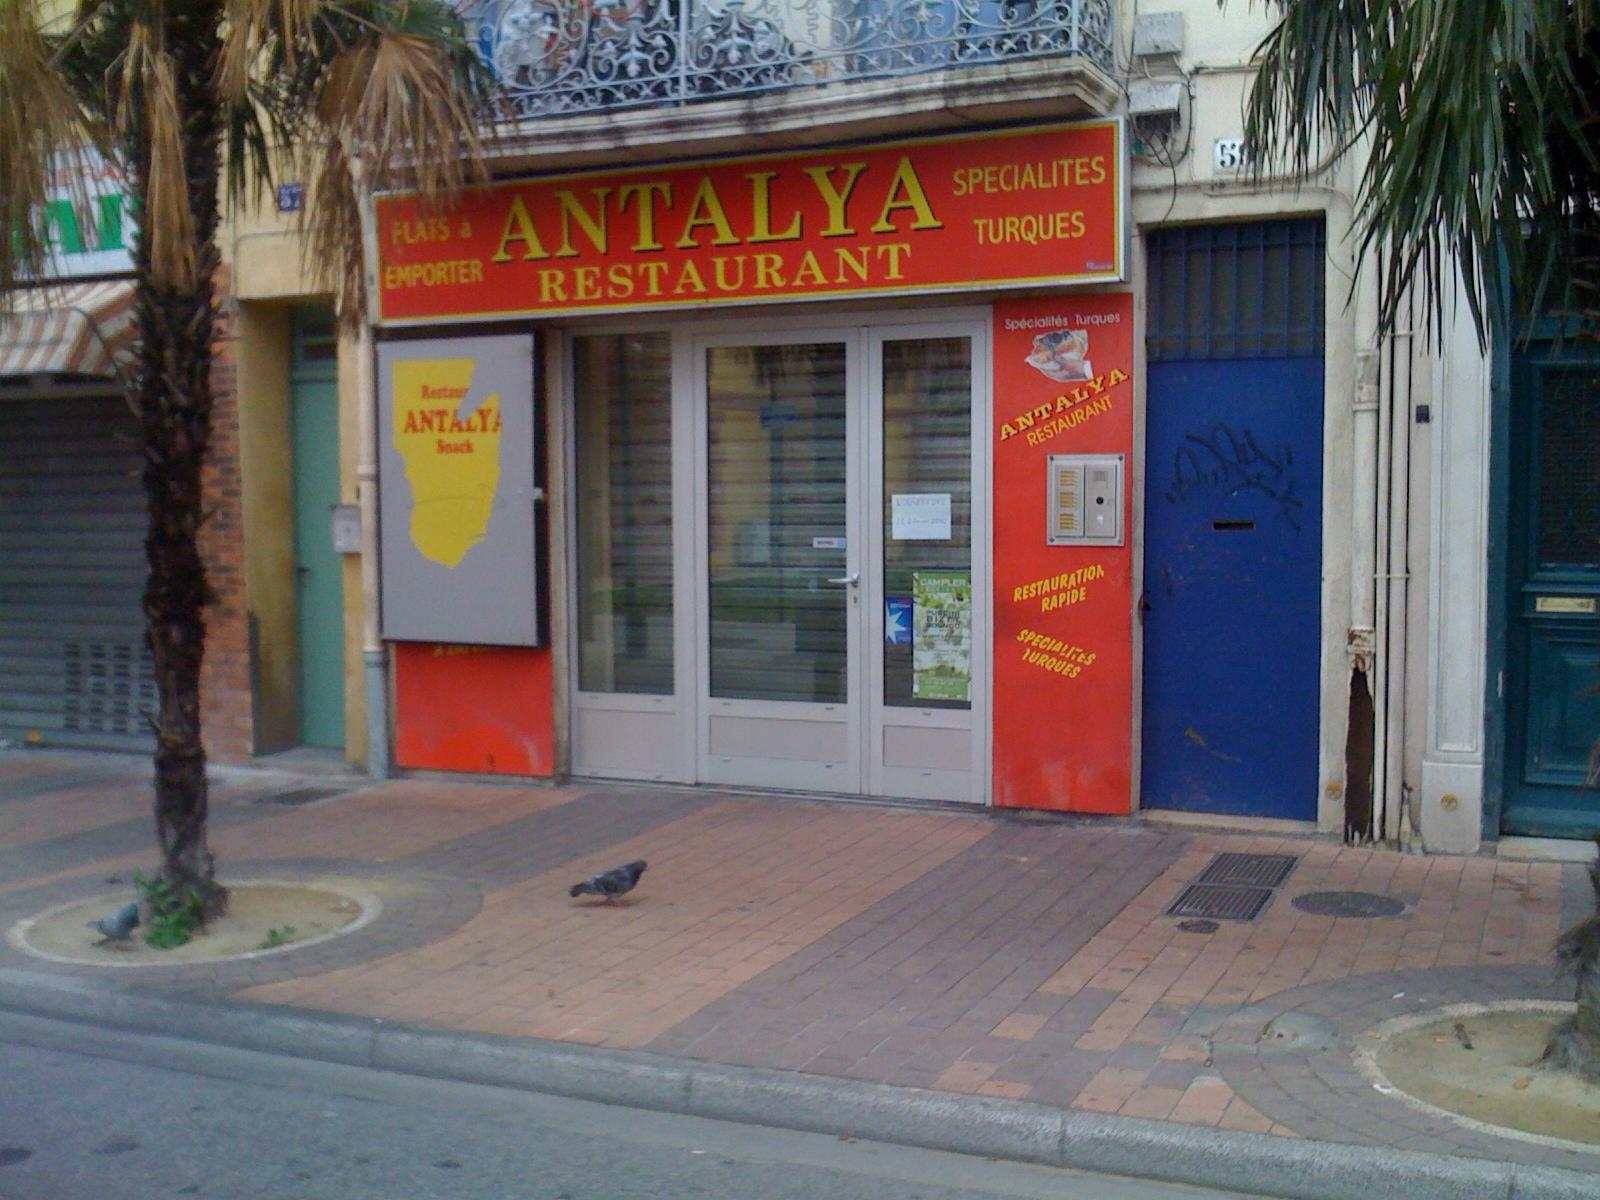 Restaurant Antalya - Perpignan